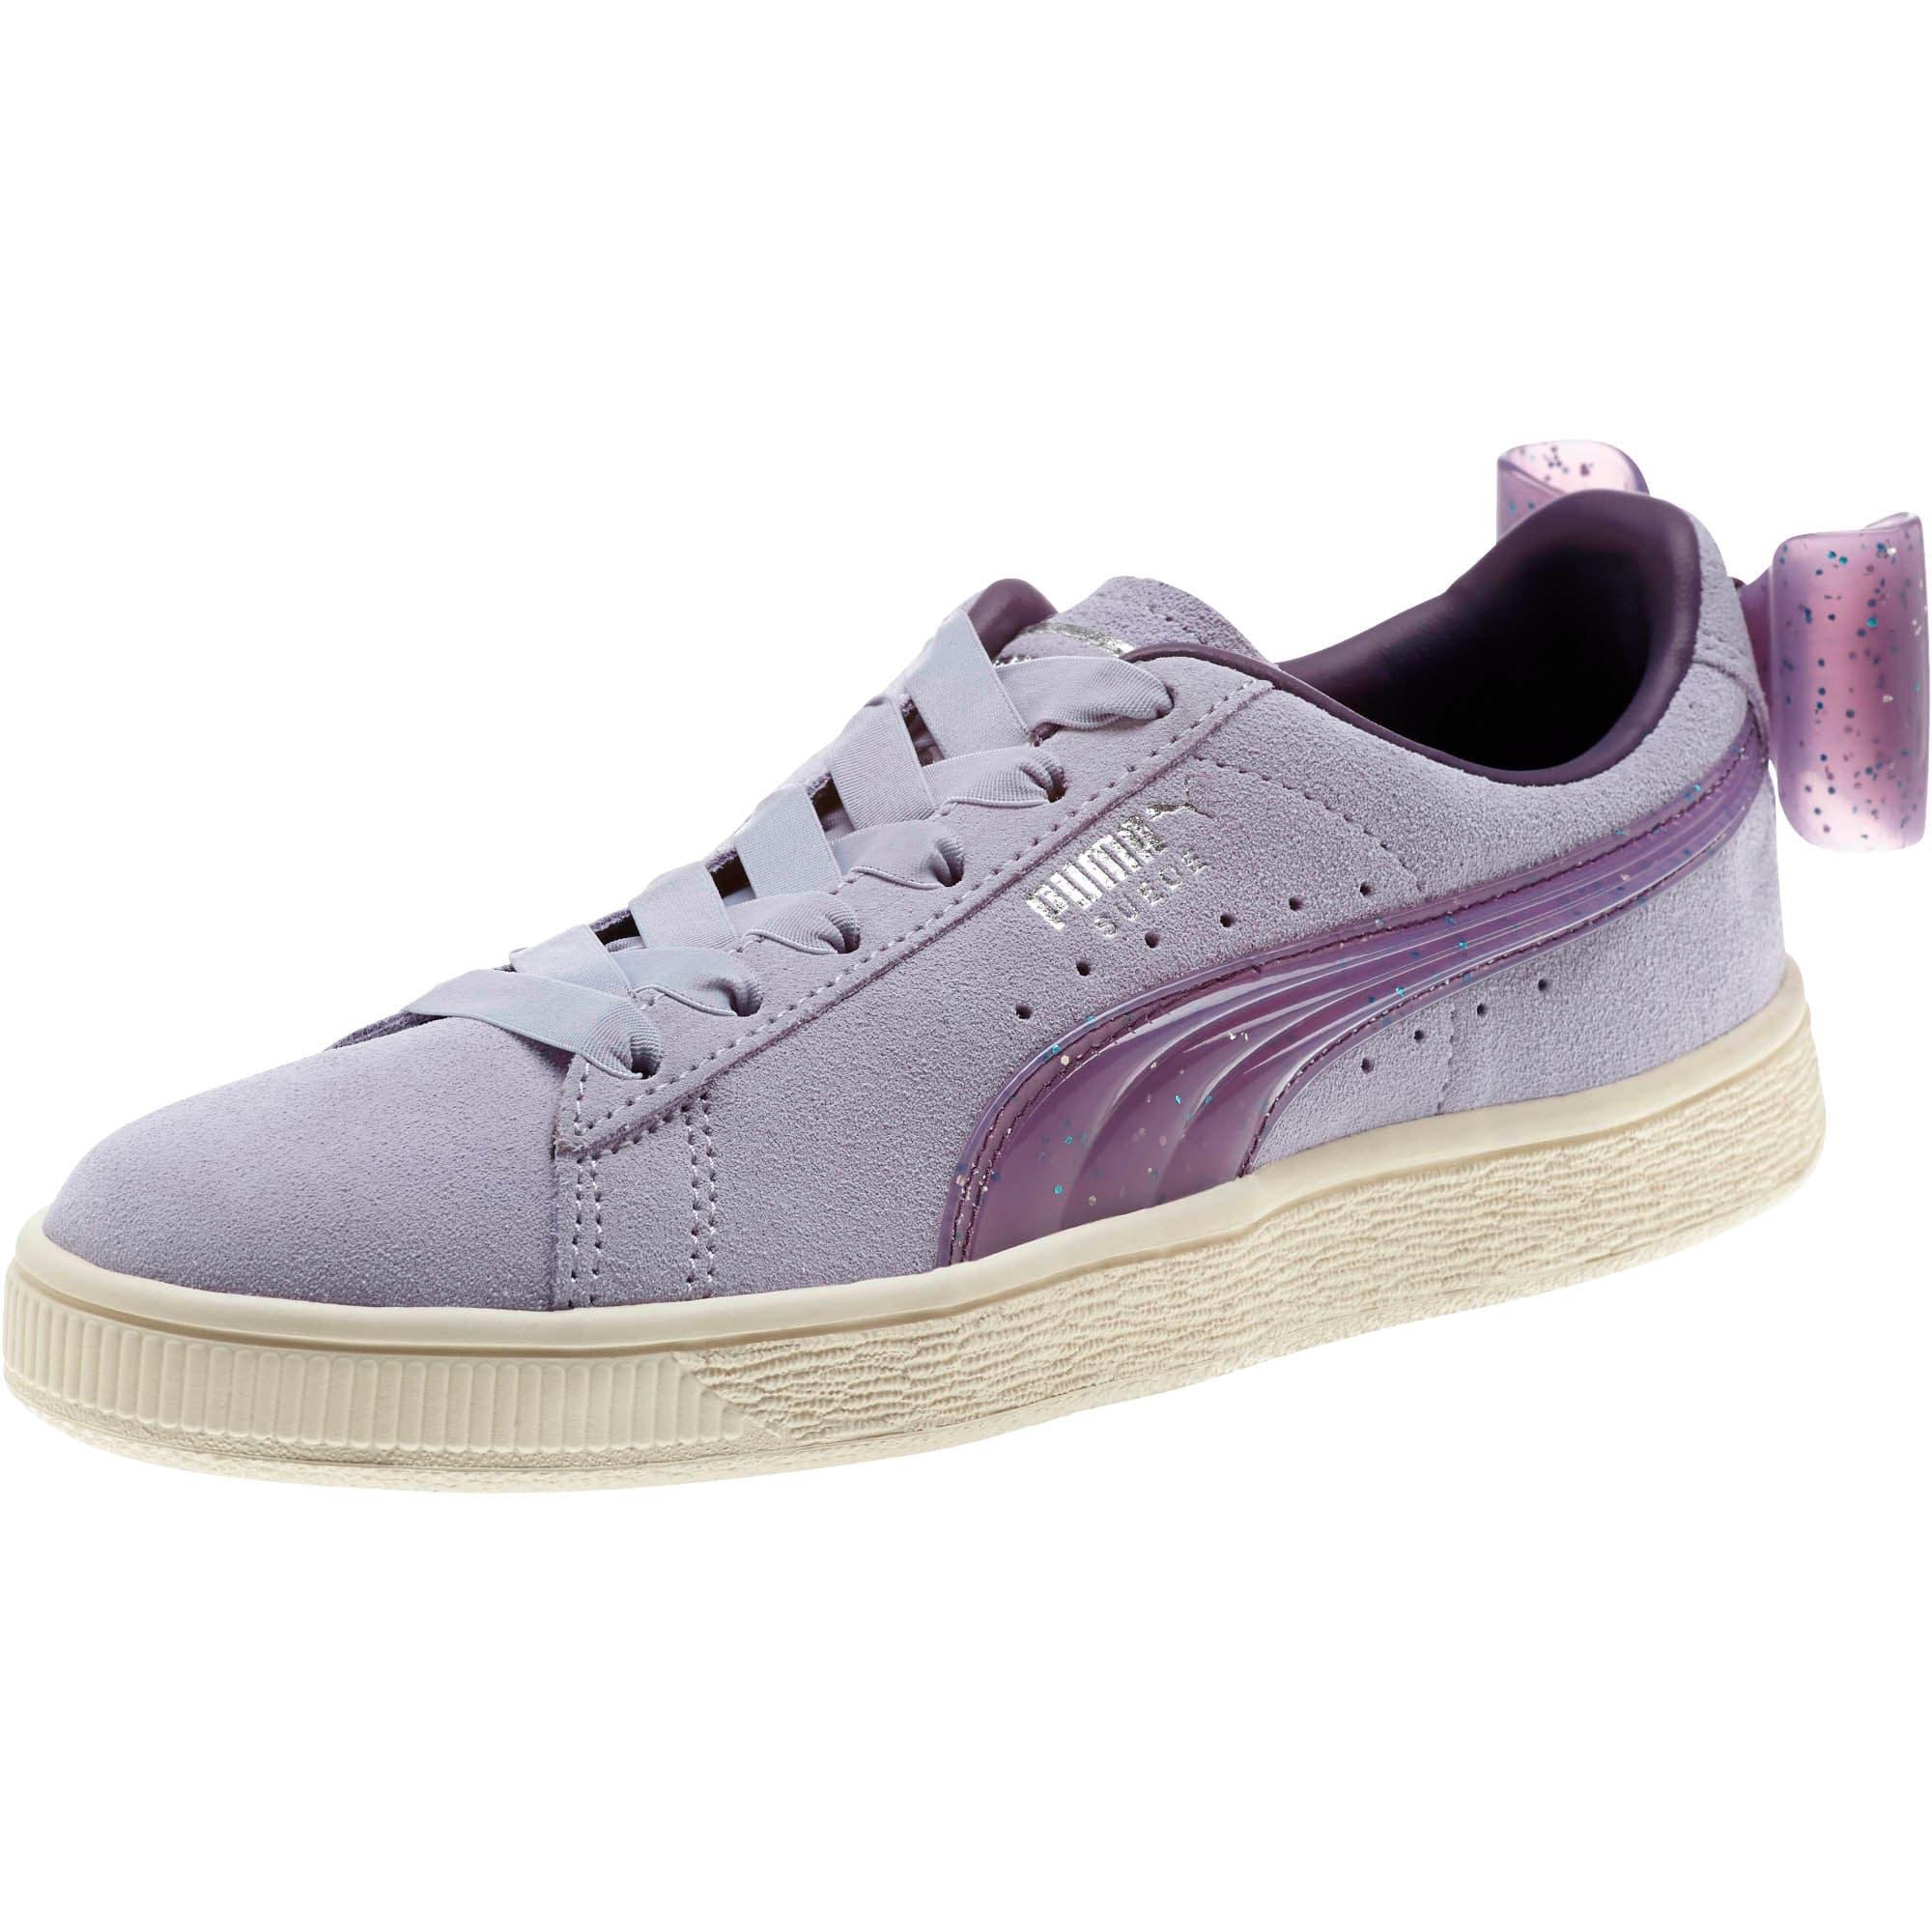 Miniatura 1 de Zapatos deportivos Suede Jelly Bow JR, SweetLavender-Indigo-White, mediano